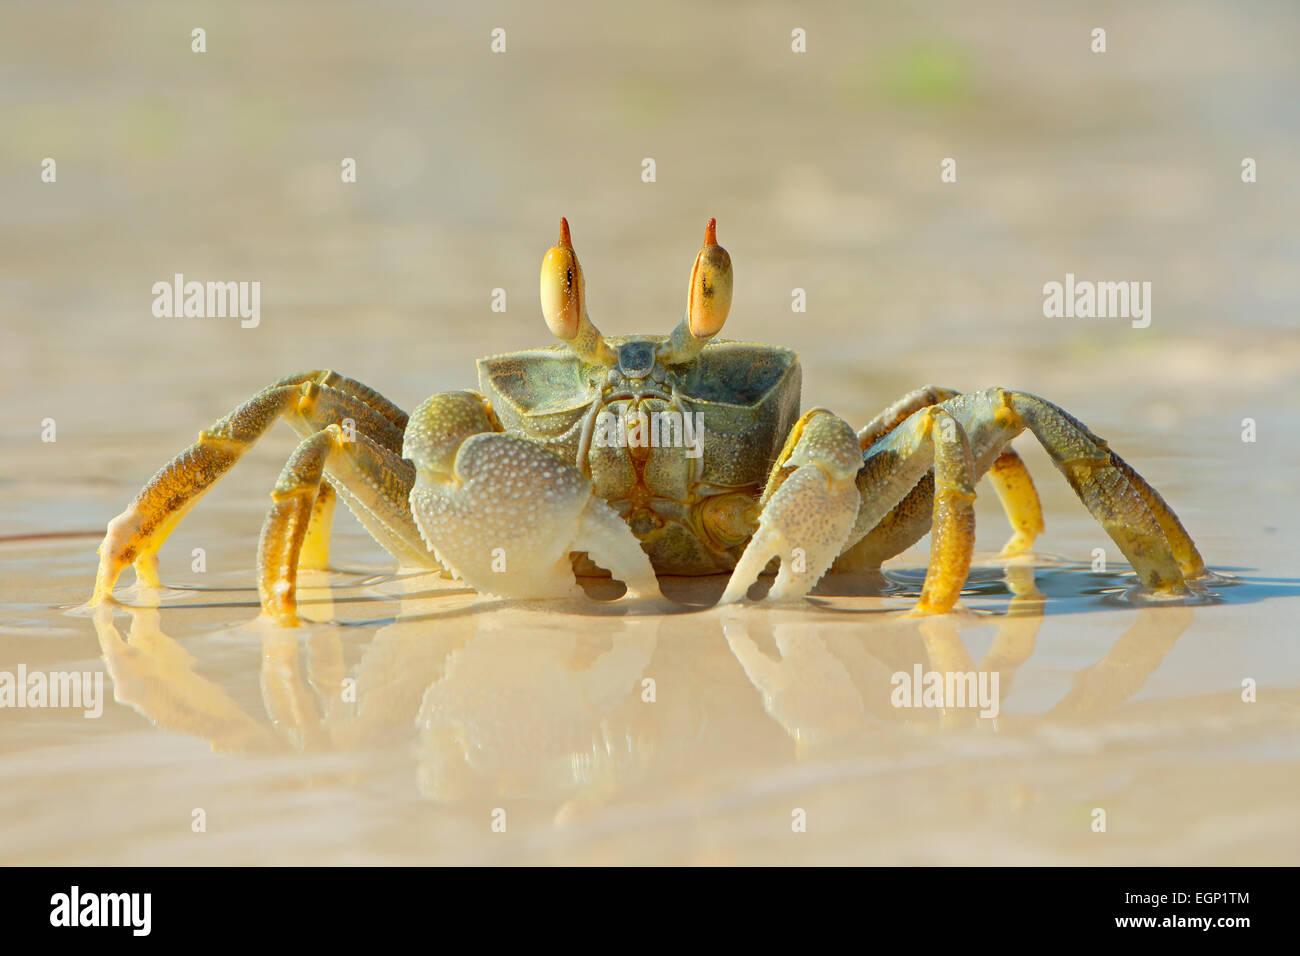 Alert ghost crab on the beach, Zanzibar island, Tanzania - Stock Image